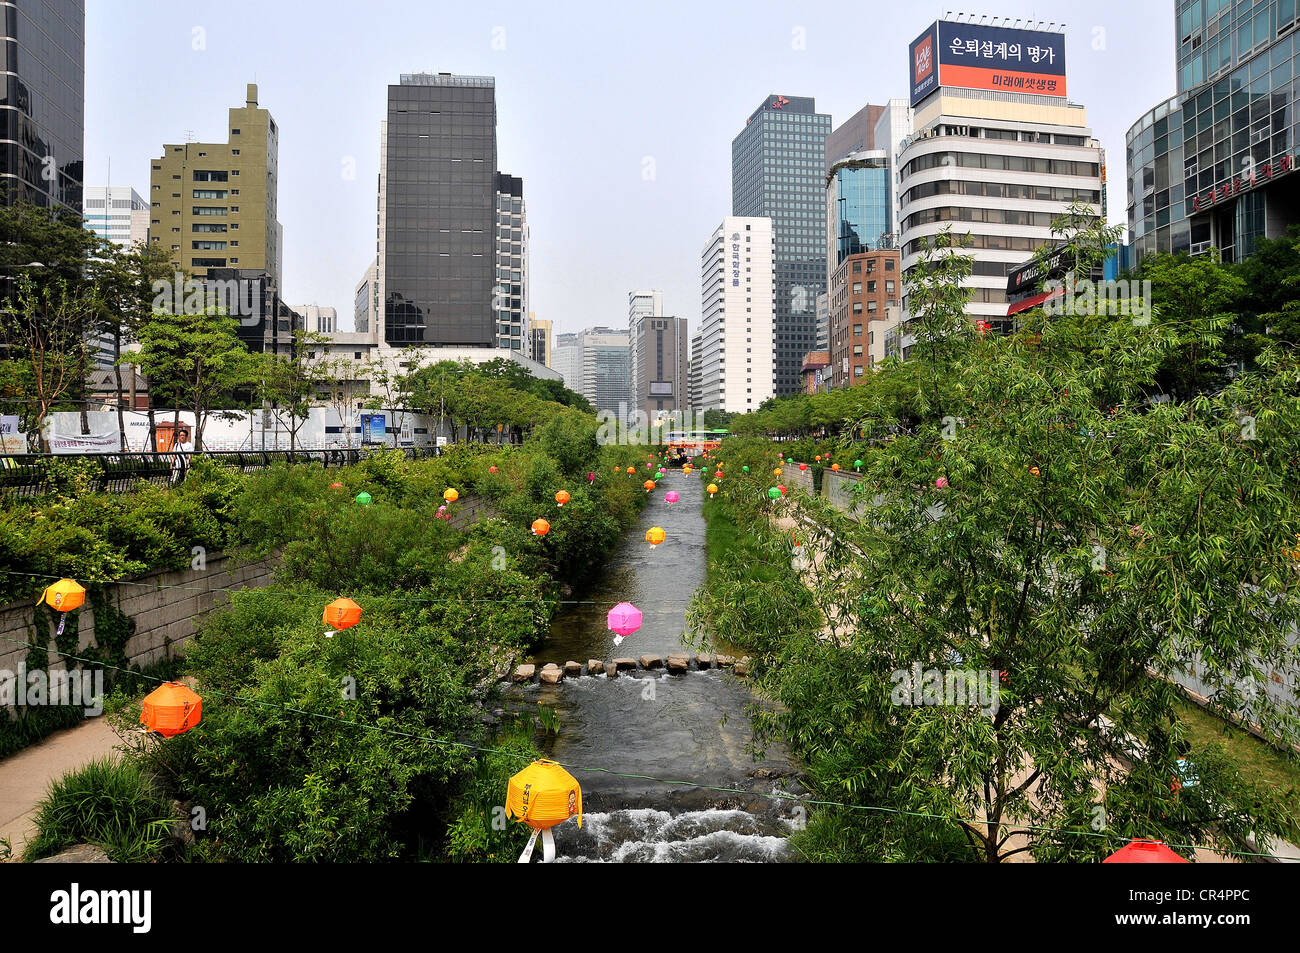 Waterside and greenery of the Cheonggyecheon stream Seoul South Korea - Stock Image